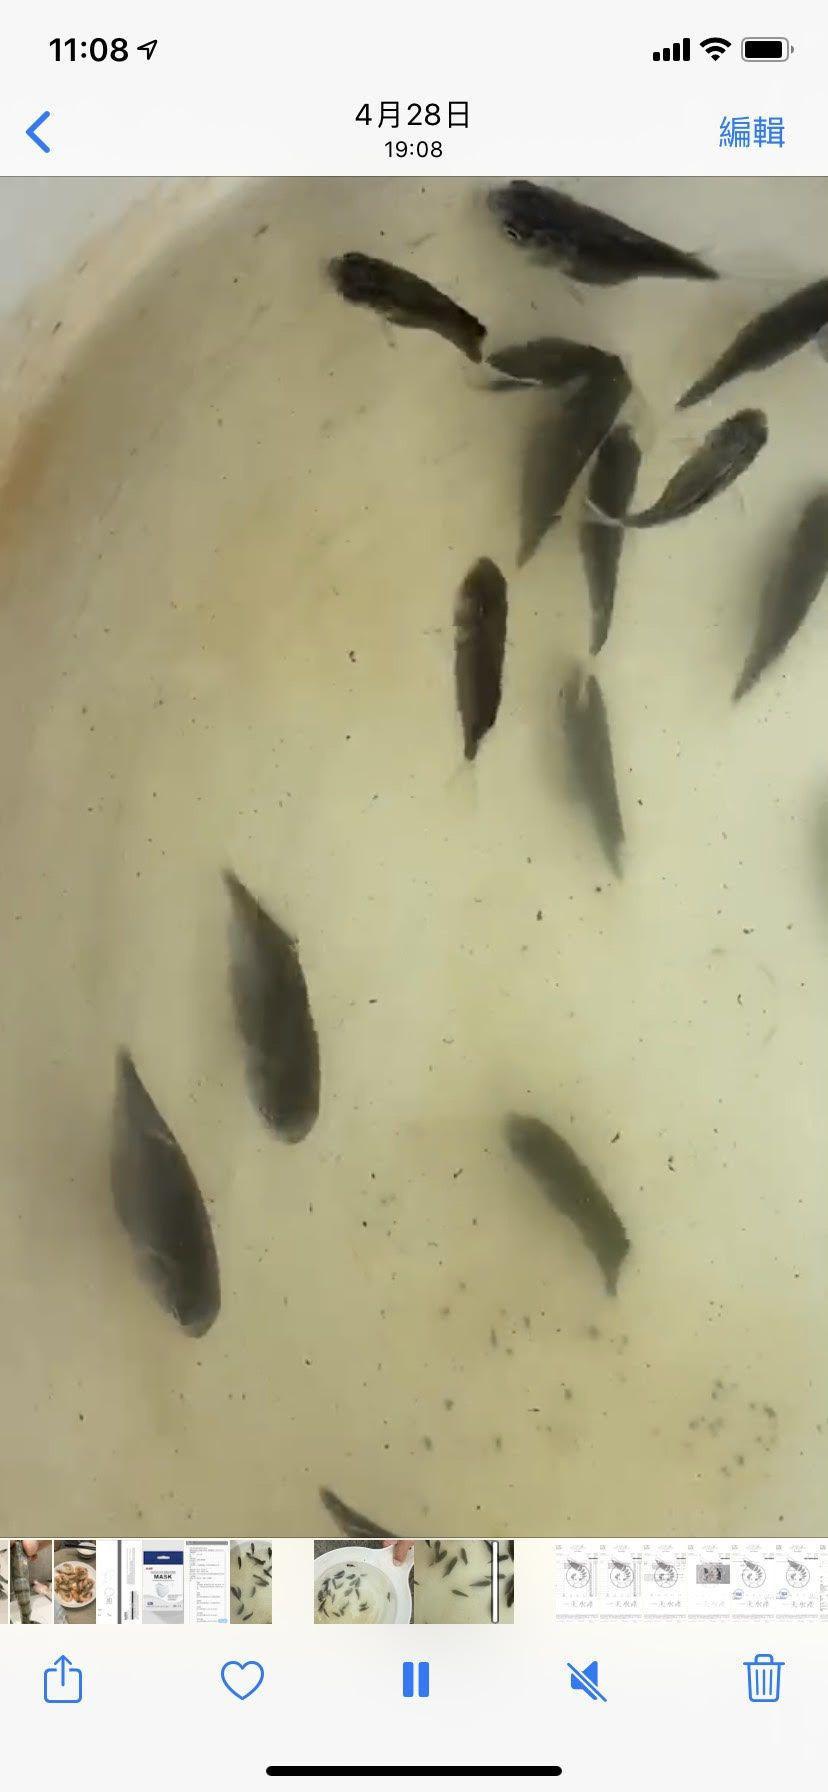 Snubnose Pompano( Trachinotus blochii)